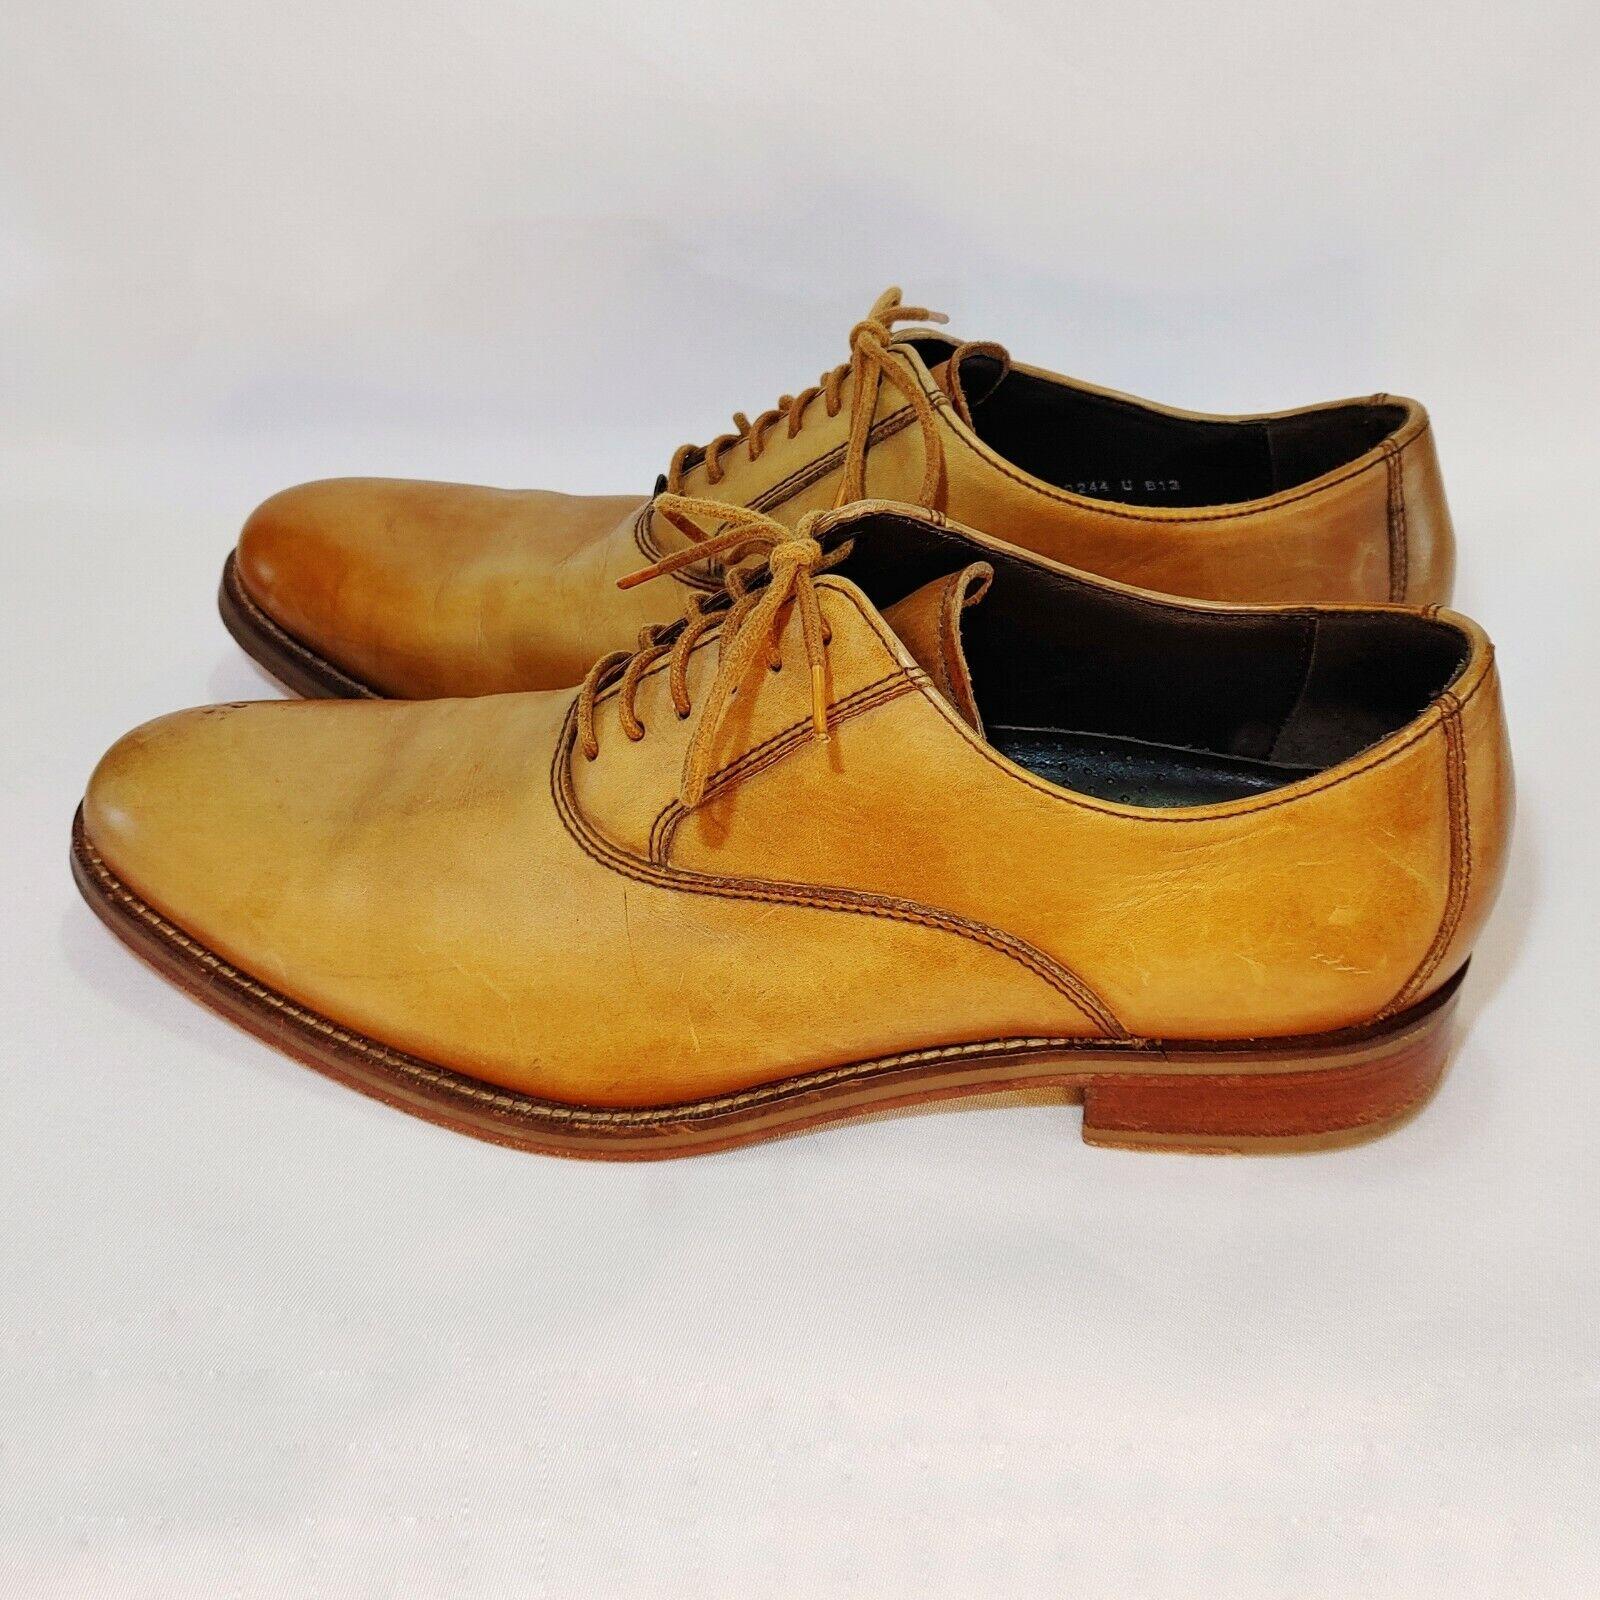 Cole Haan NikeAir C10244 Mens Tan Cap Toe Oxford Madison Shoes Sz 9M Embellished